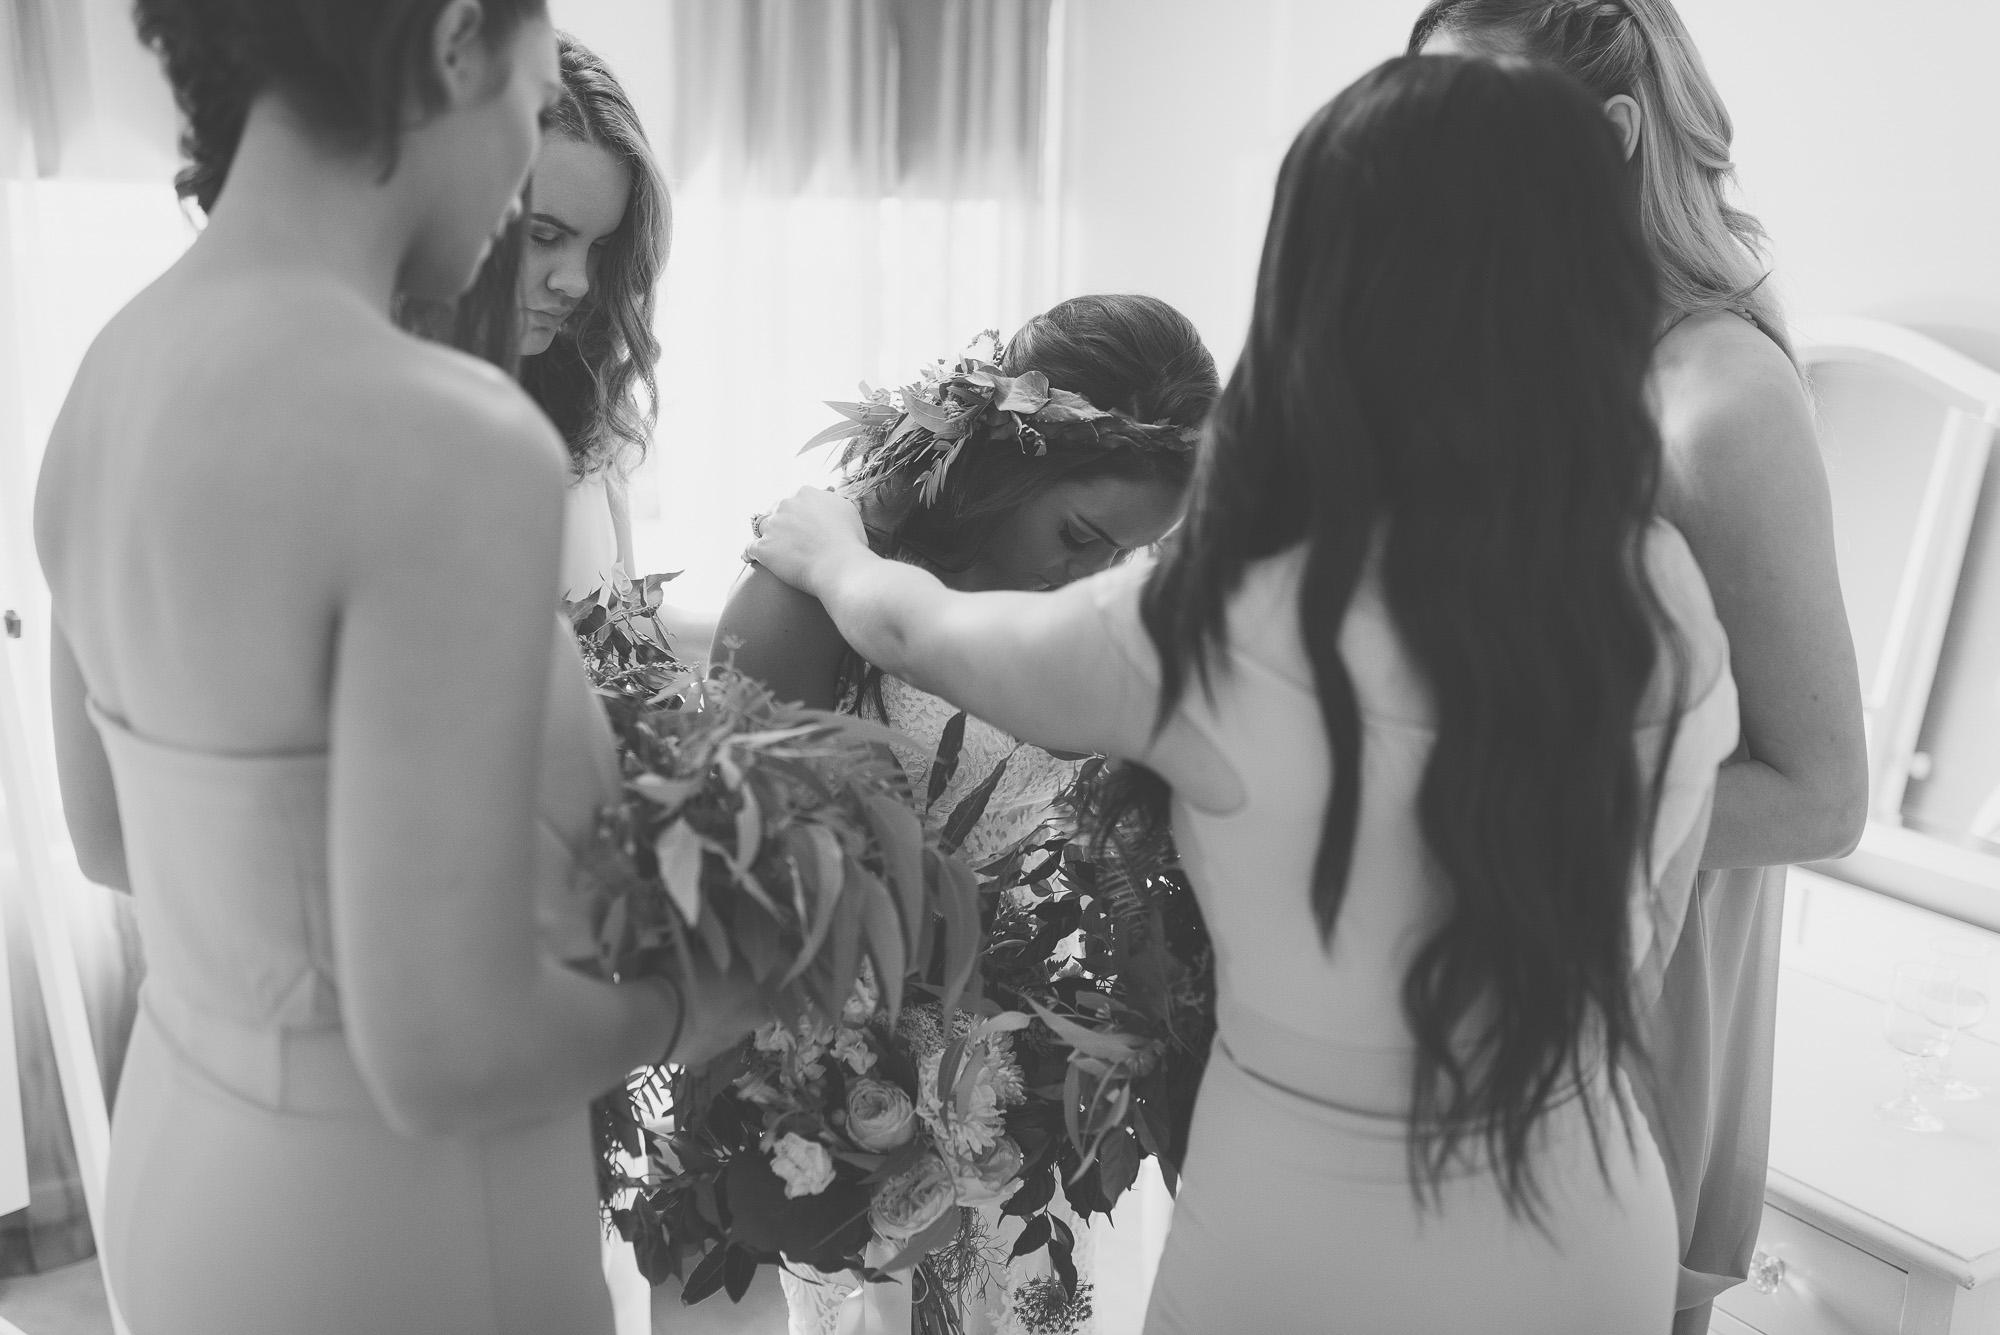 wedding-photographer-outdoor-casual-styled-los-angeles-australia-california-international-earthbound -27.jpg